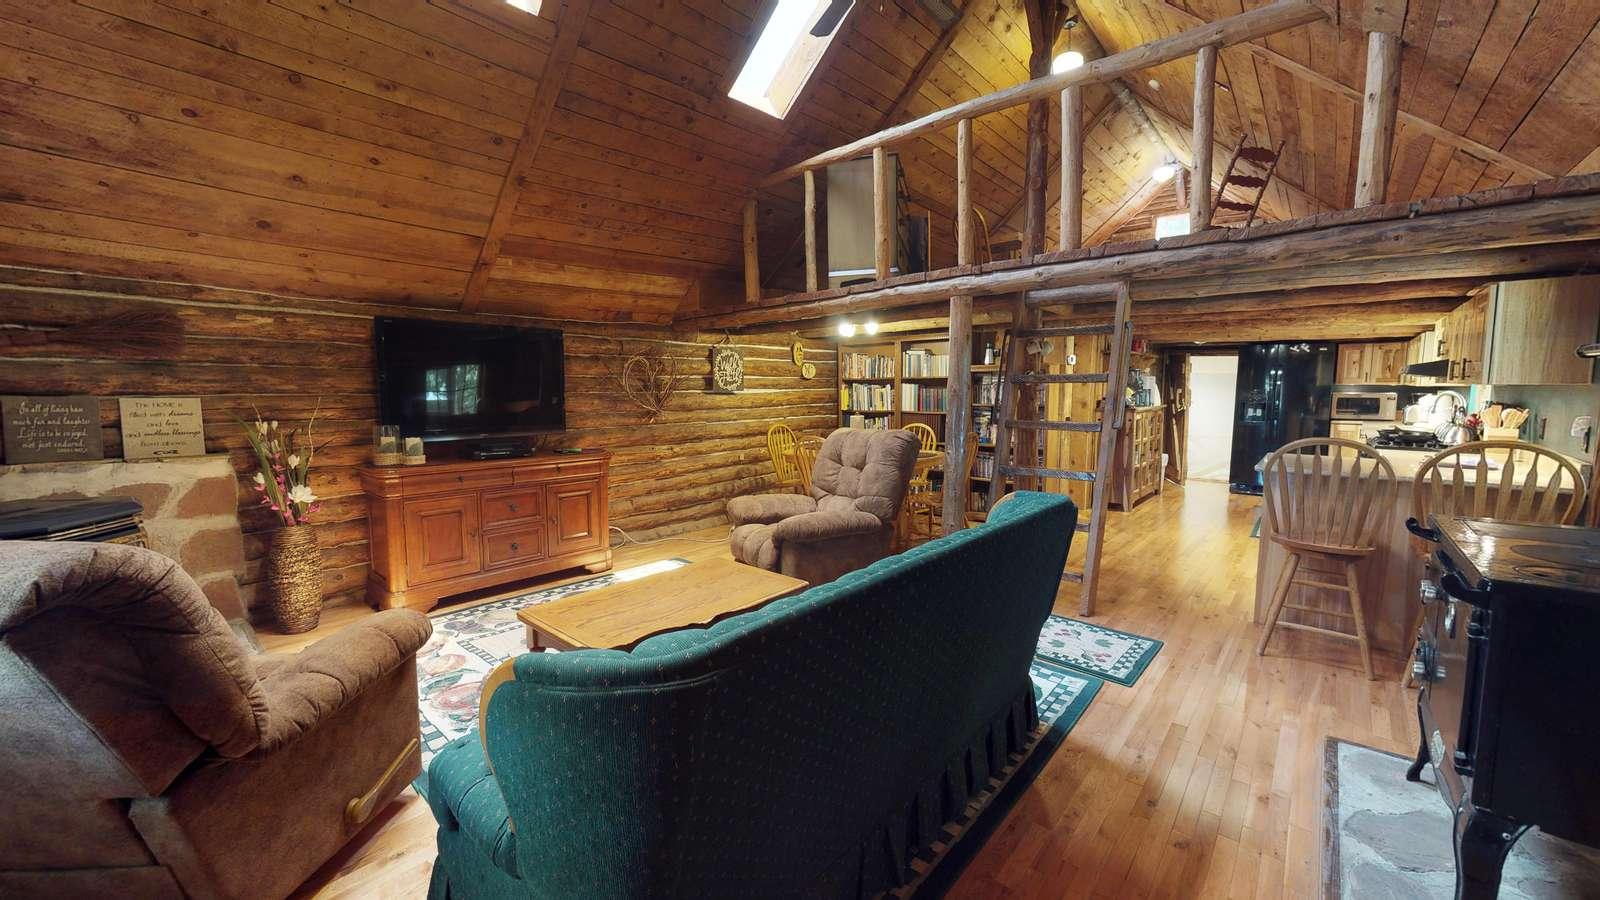 Stunning Apple Lane Log Cabin - Canyonlands